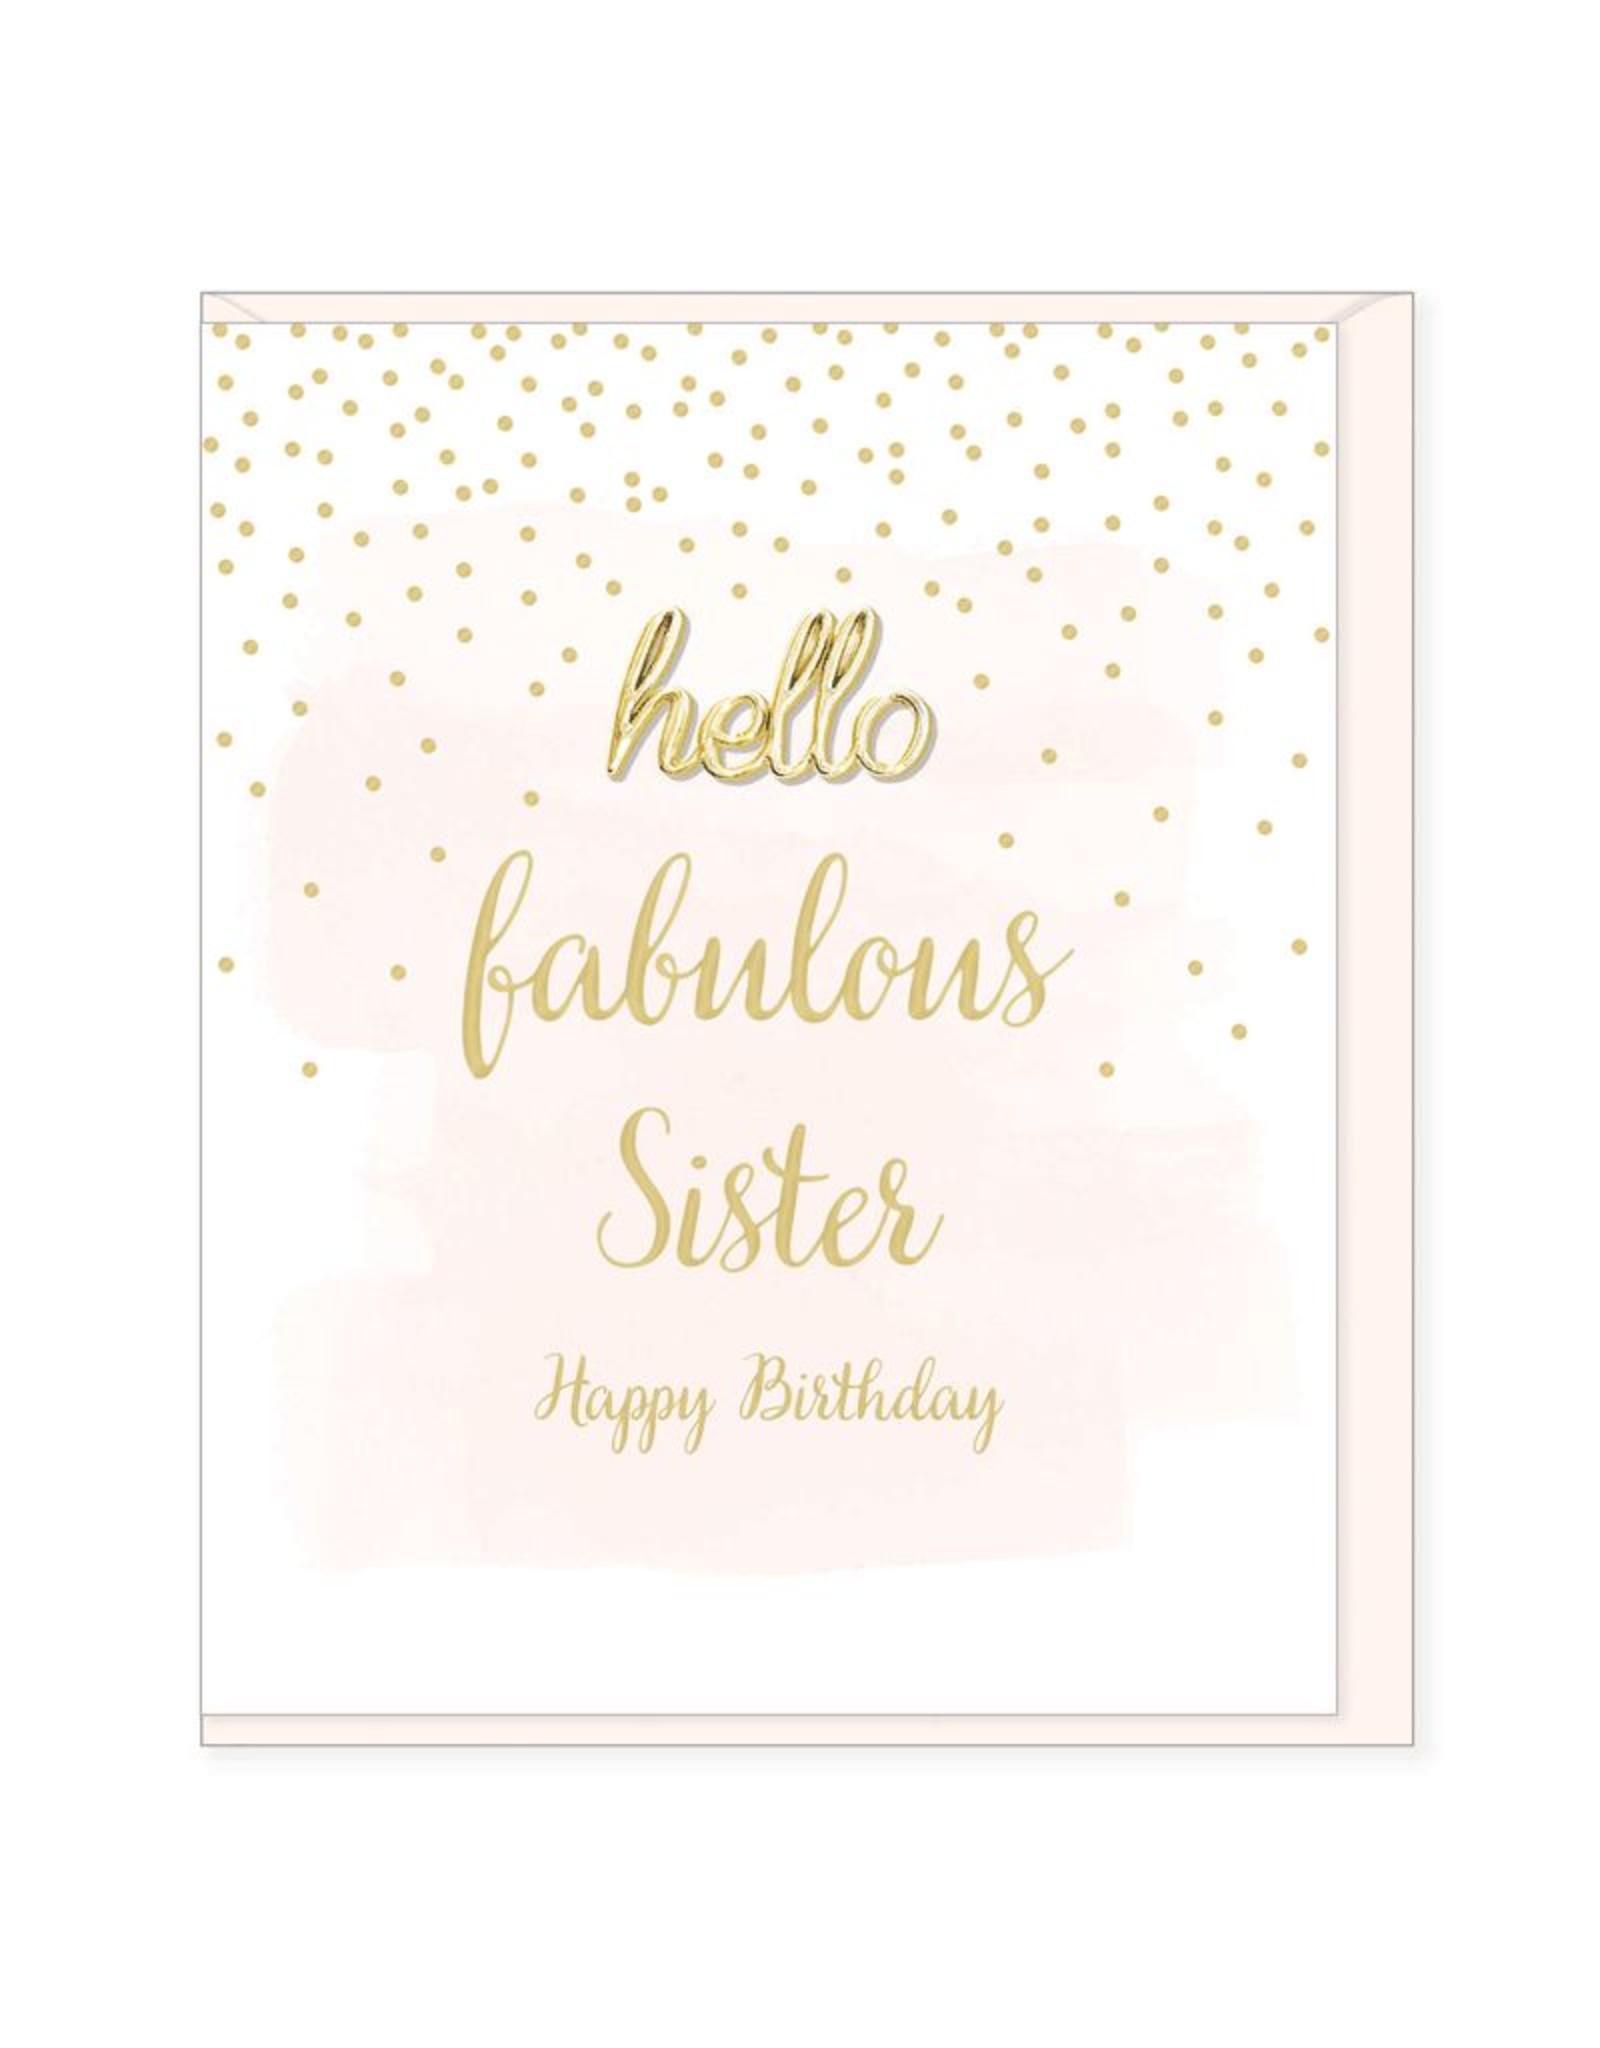 Hearts Design Wenskaart - Fabulous Sister, Happy Birthday